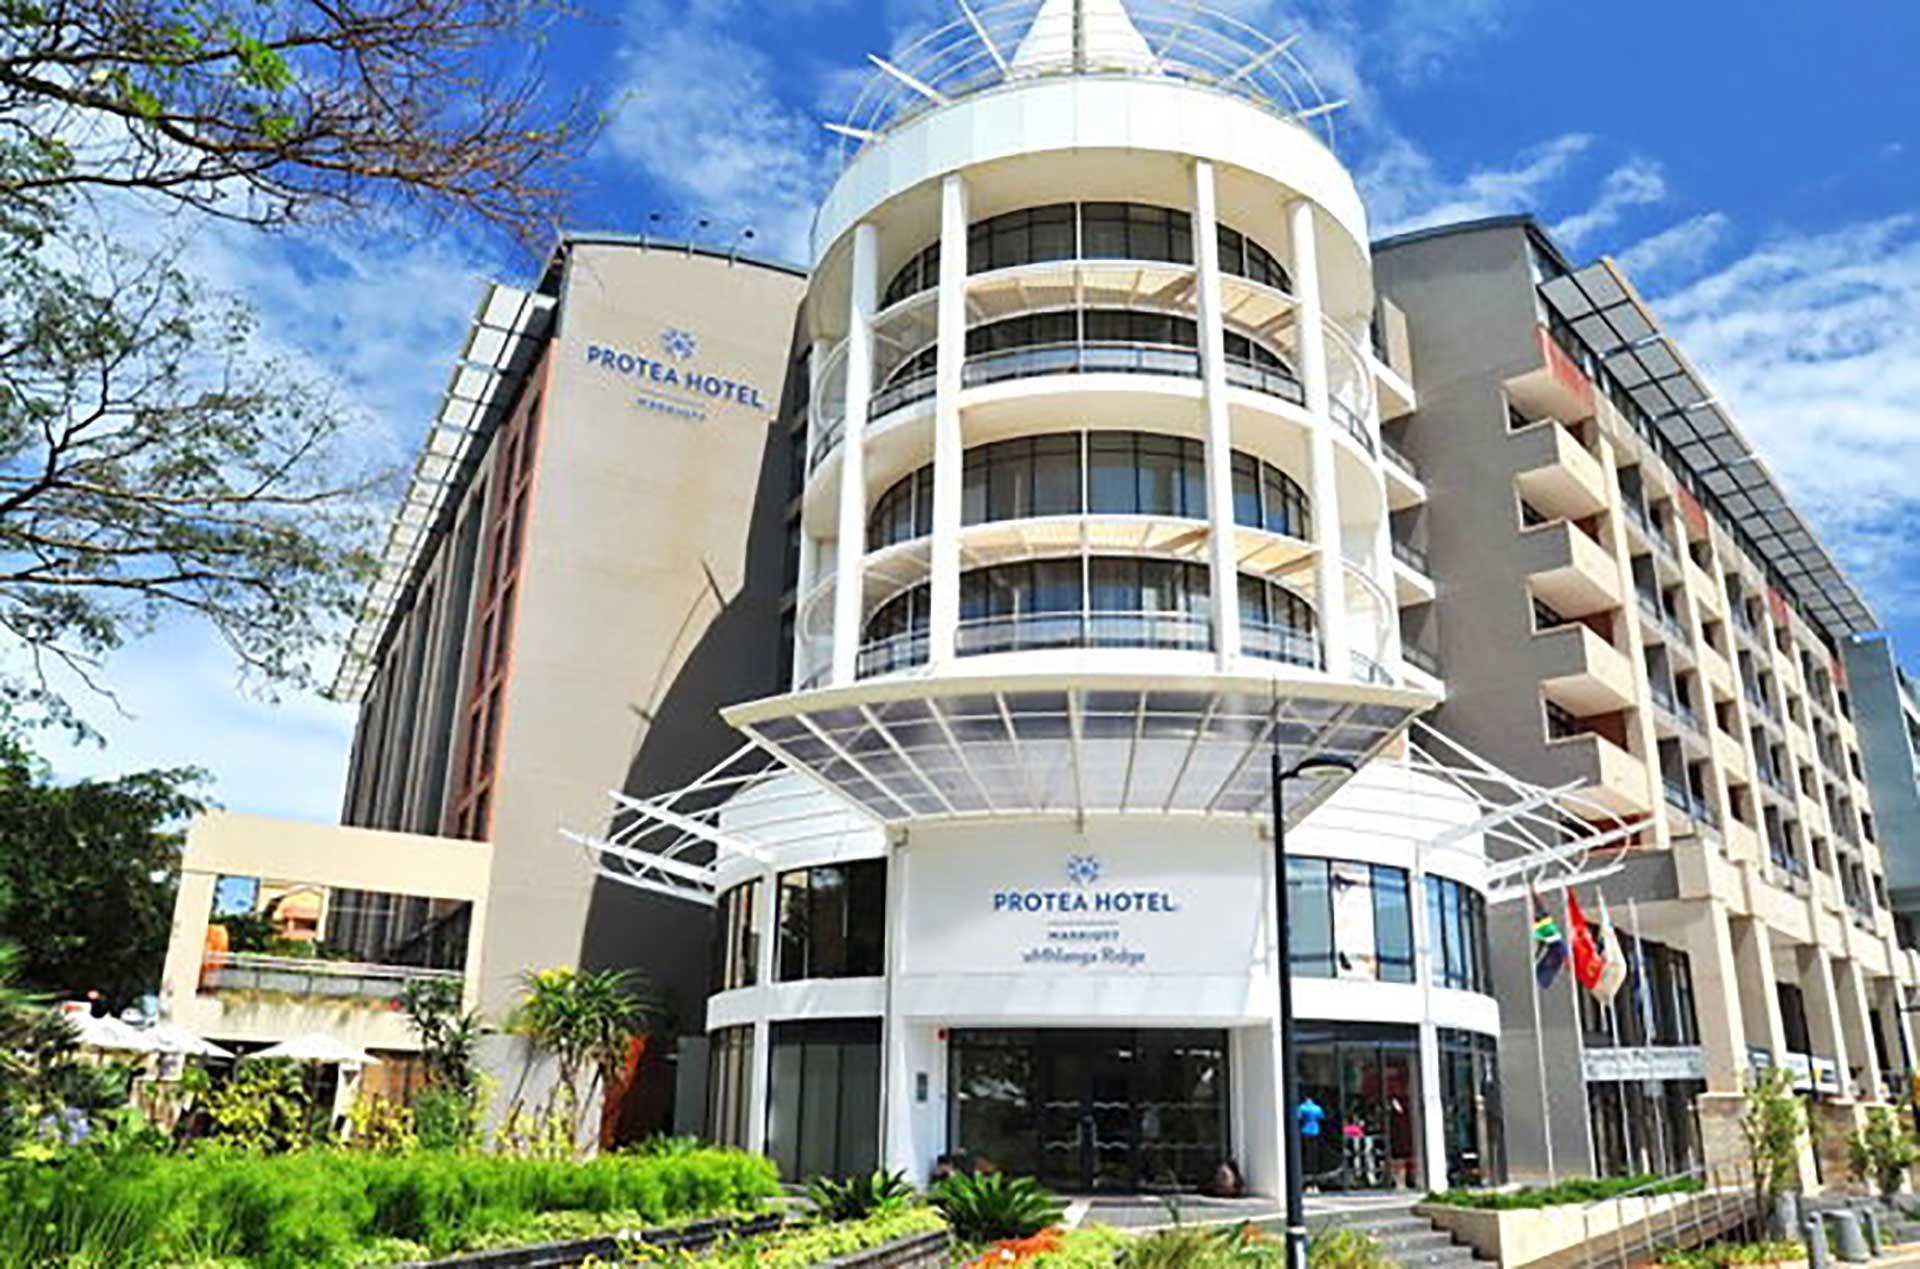 Protea-Hotel-Umhlanga-Ridge